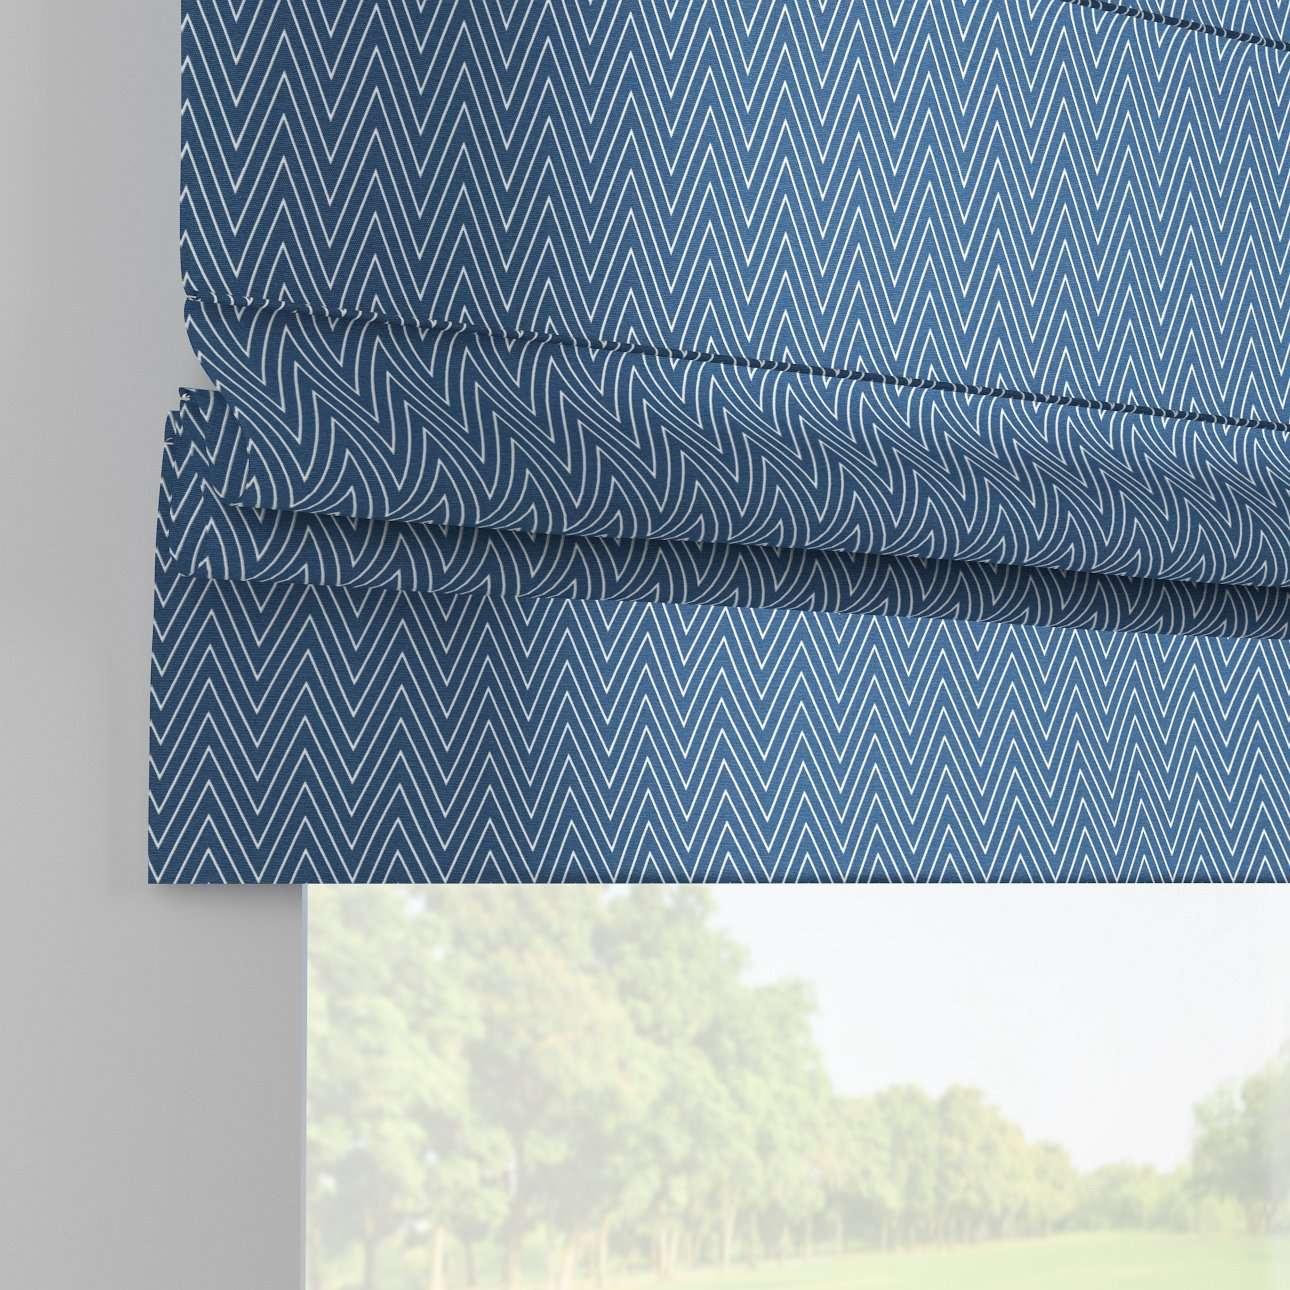 Foldegardin Paris<br/>Med lige flæse 80 x 170 cm fra kollektionen Brooklyn , Stof: 137-88